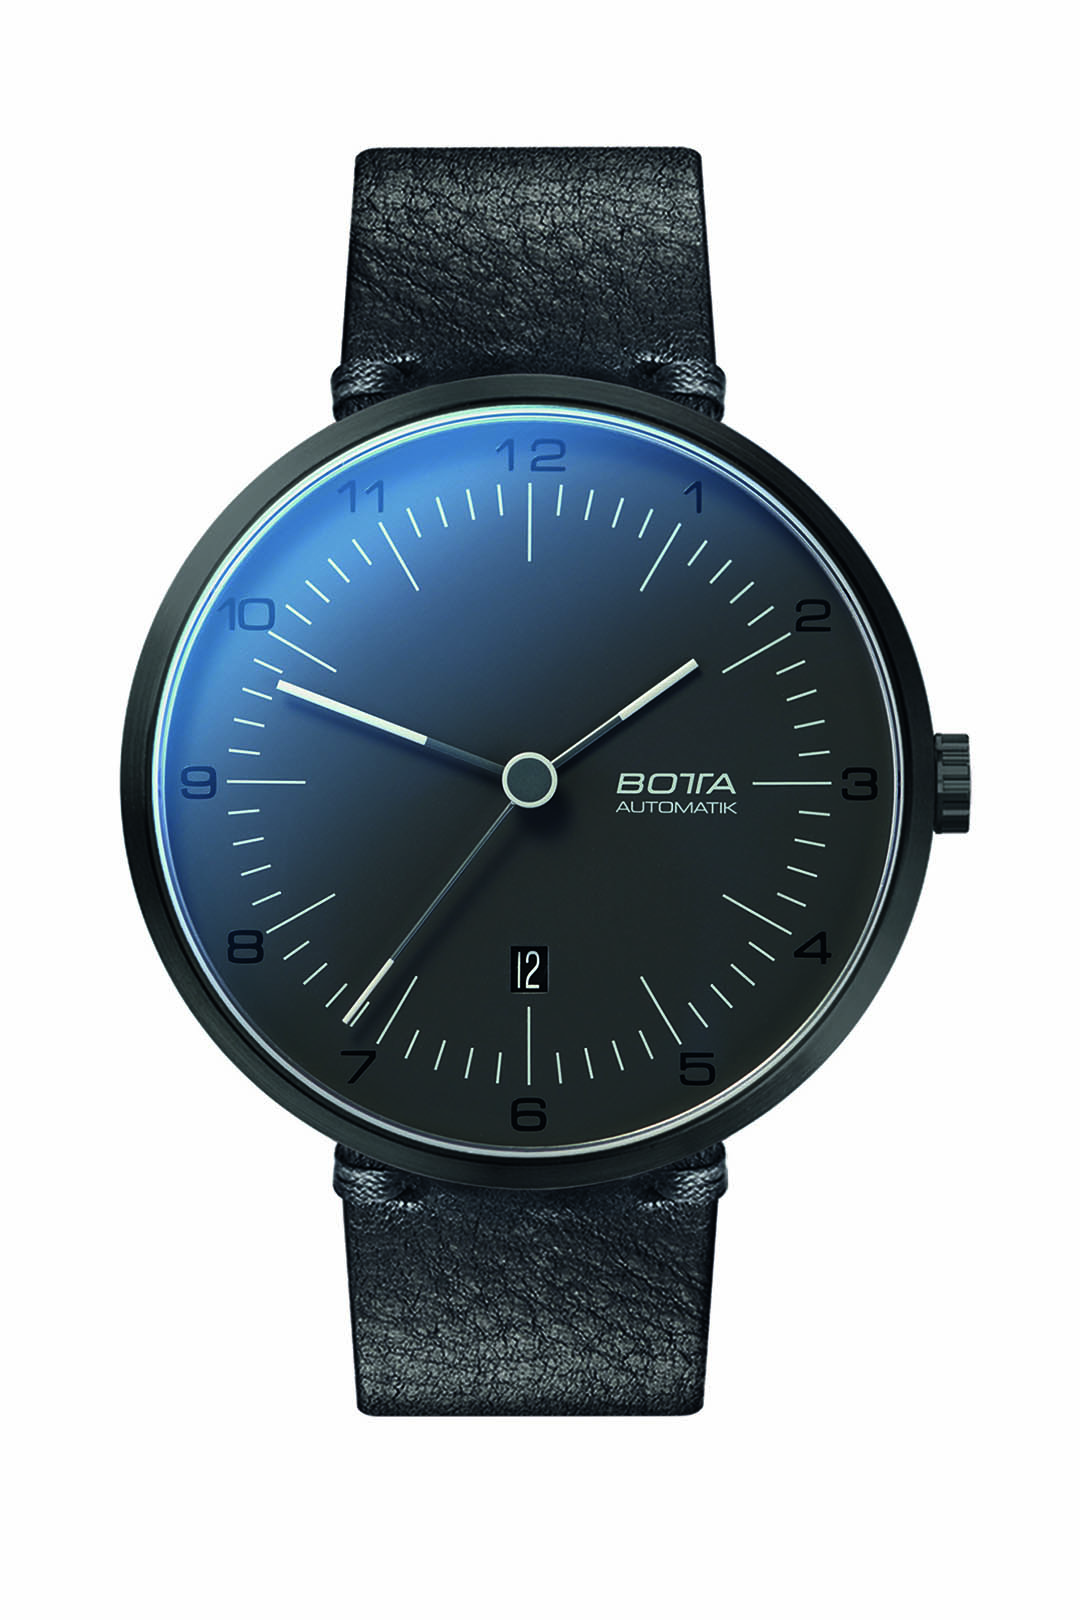 Botta Design